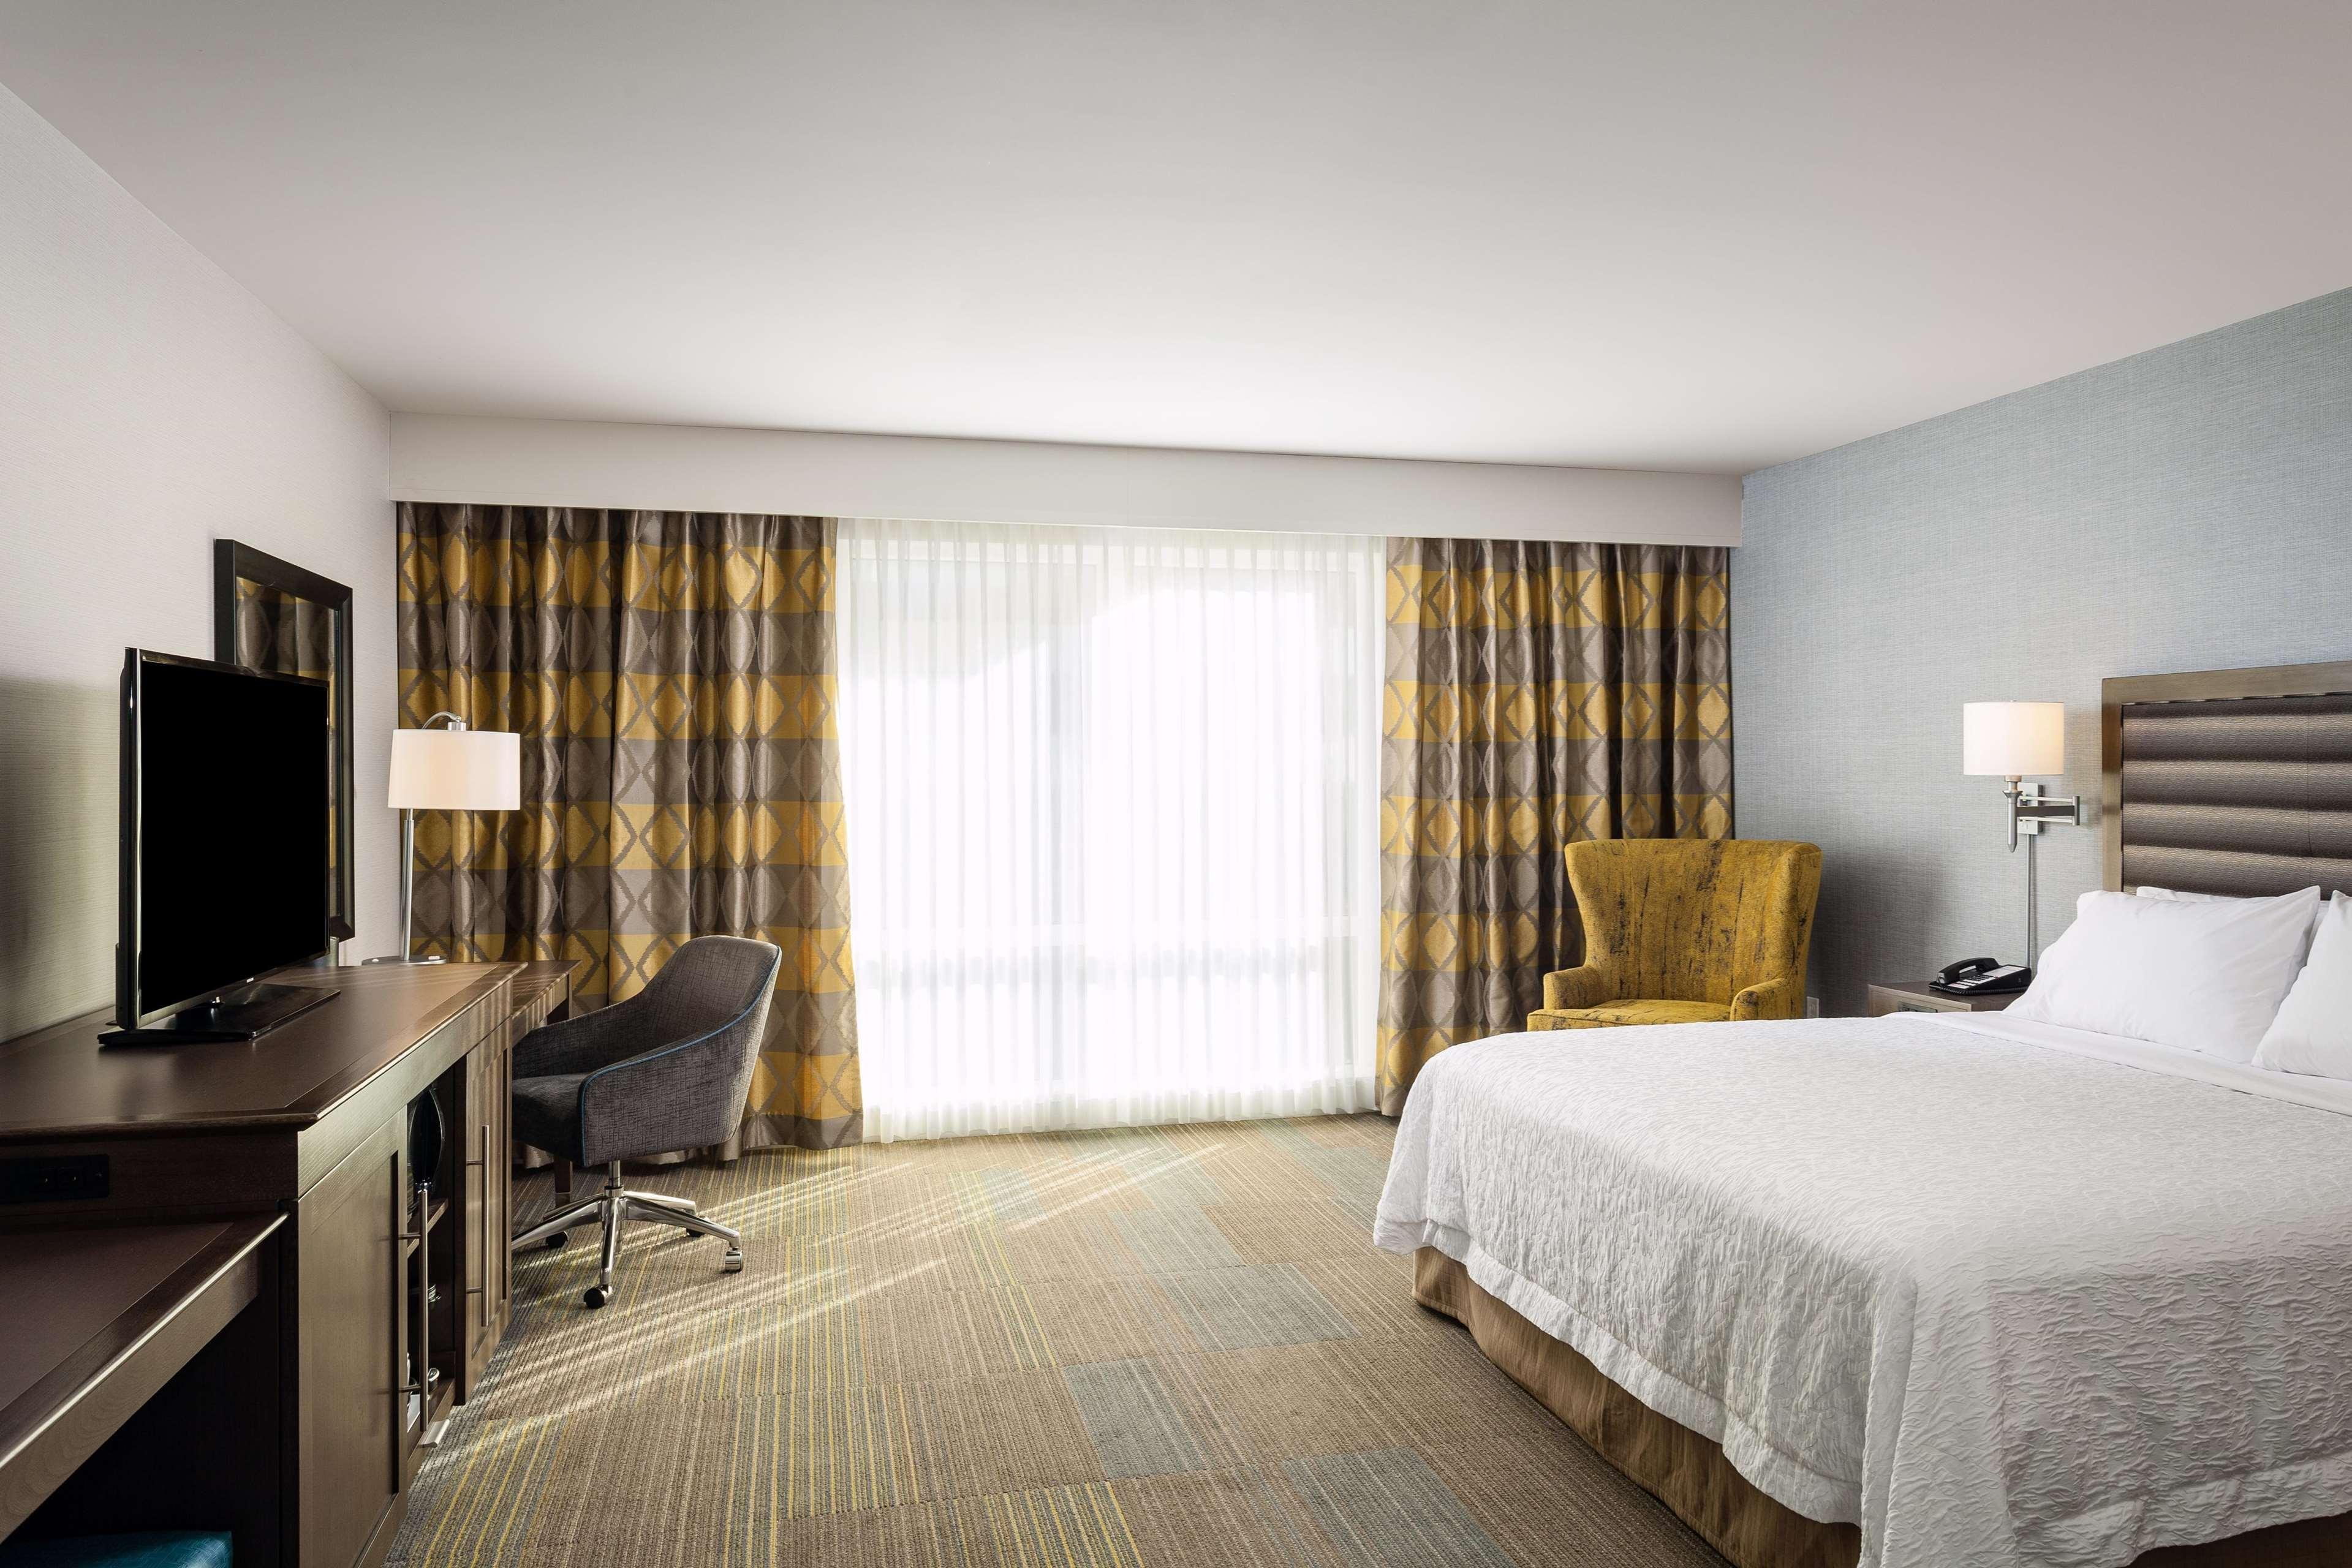 Hampton Inn & Suites by Hilton Seattle/Northgate image 34